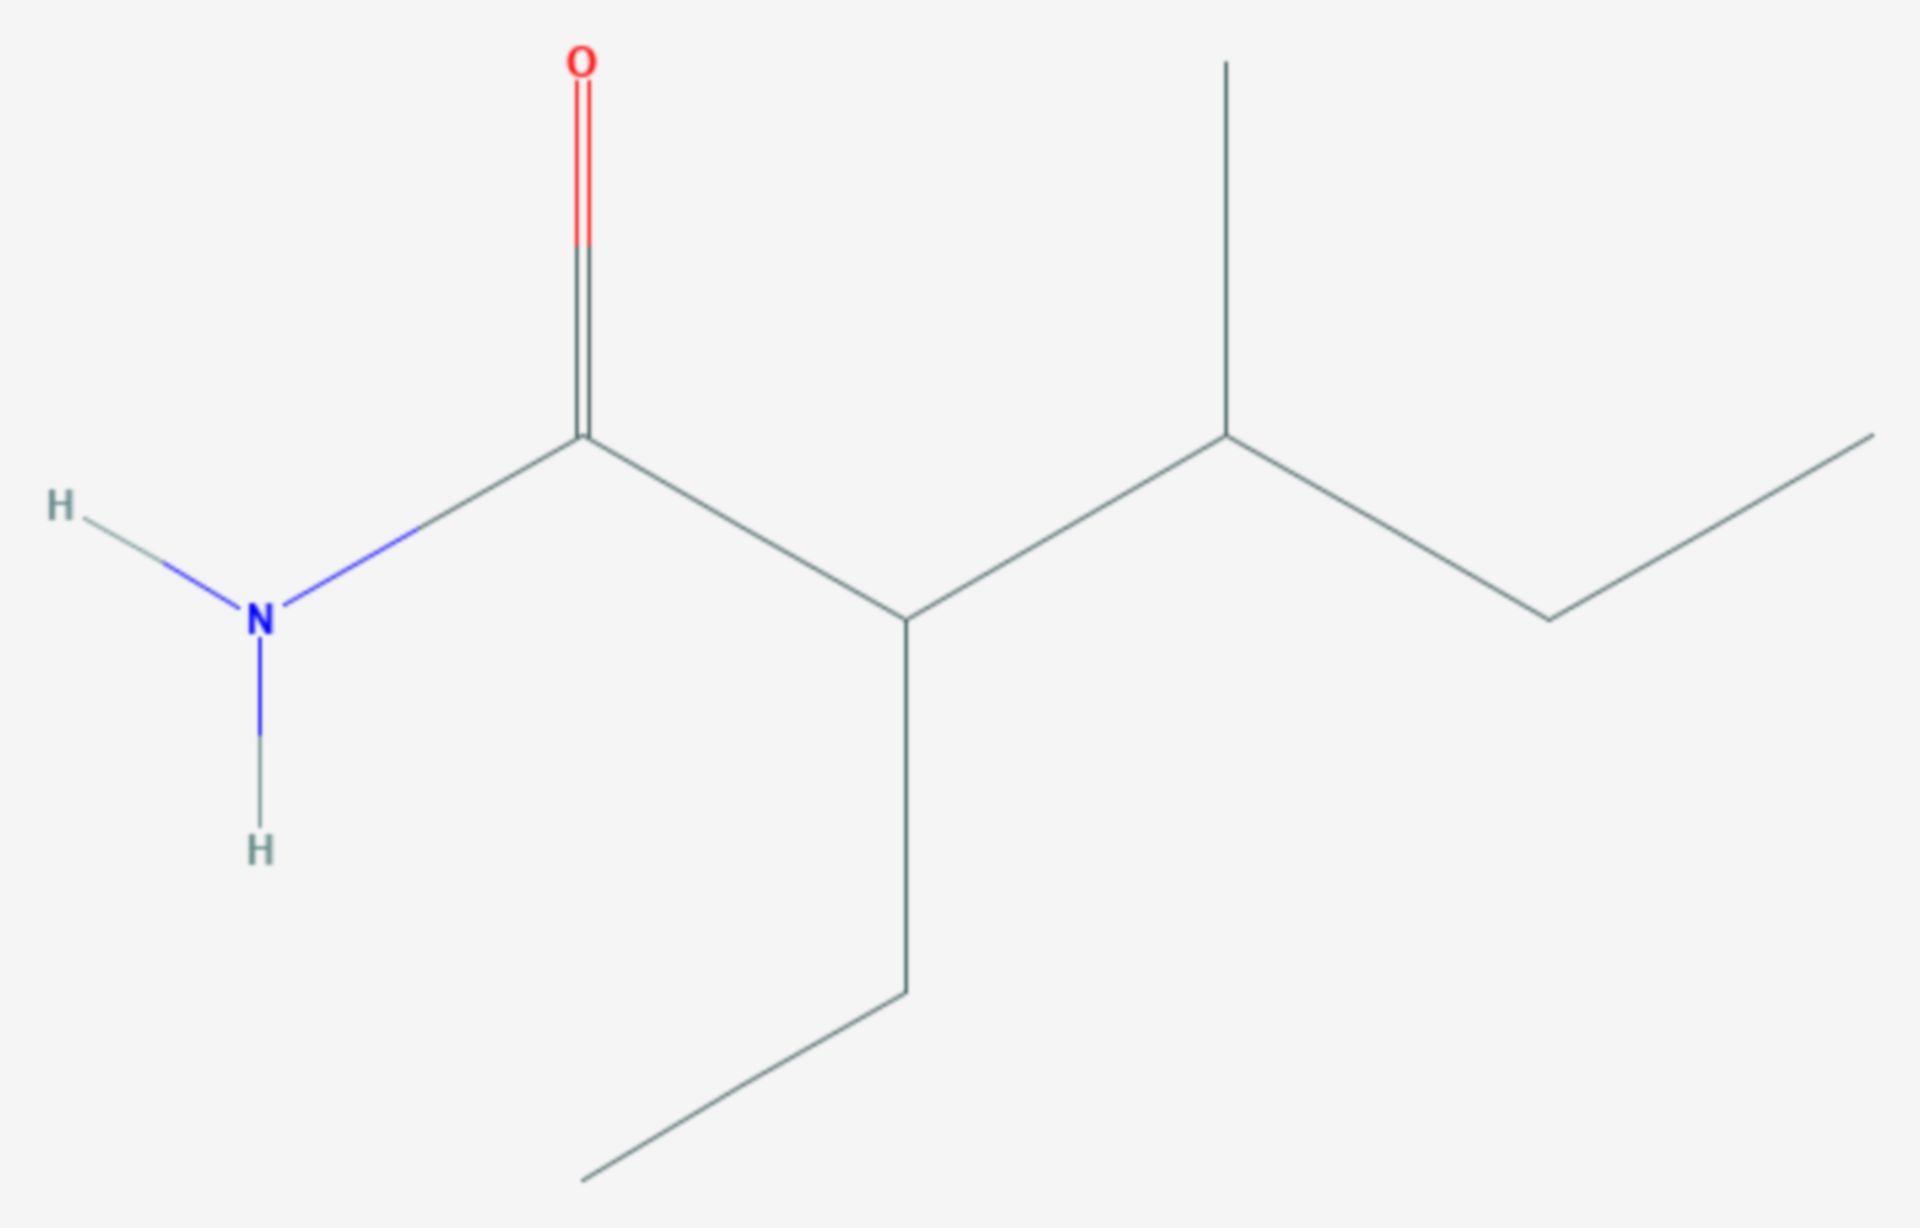 Valnoctamid (Strukturformel)